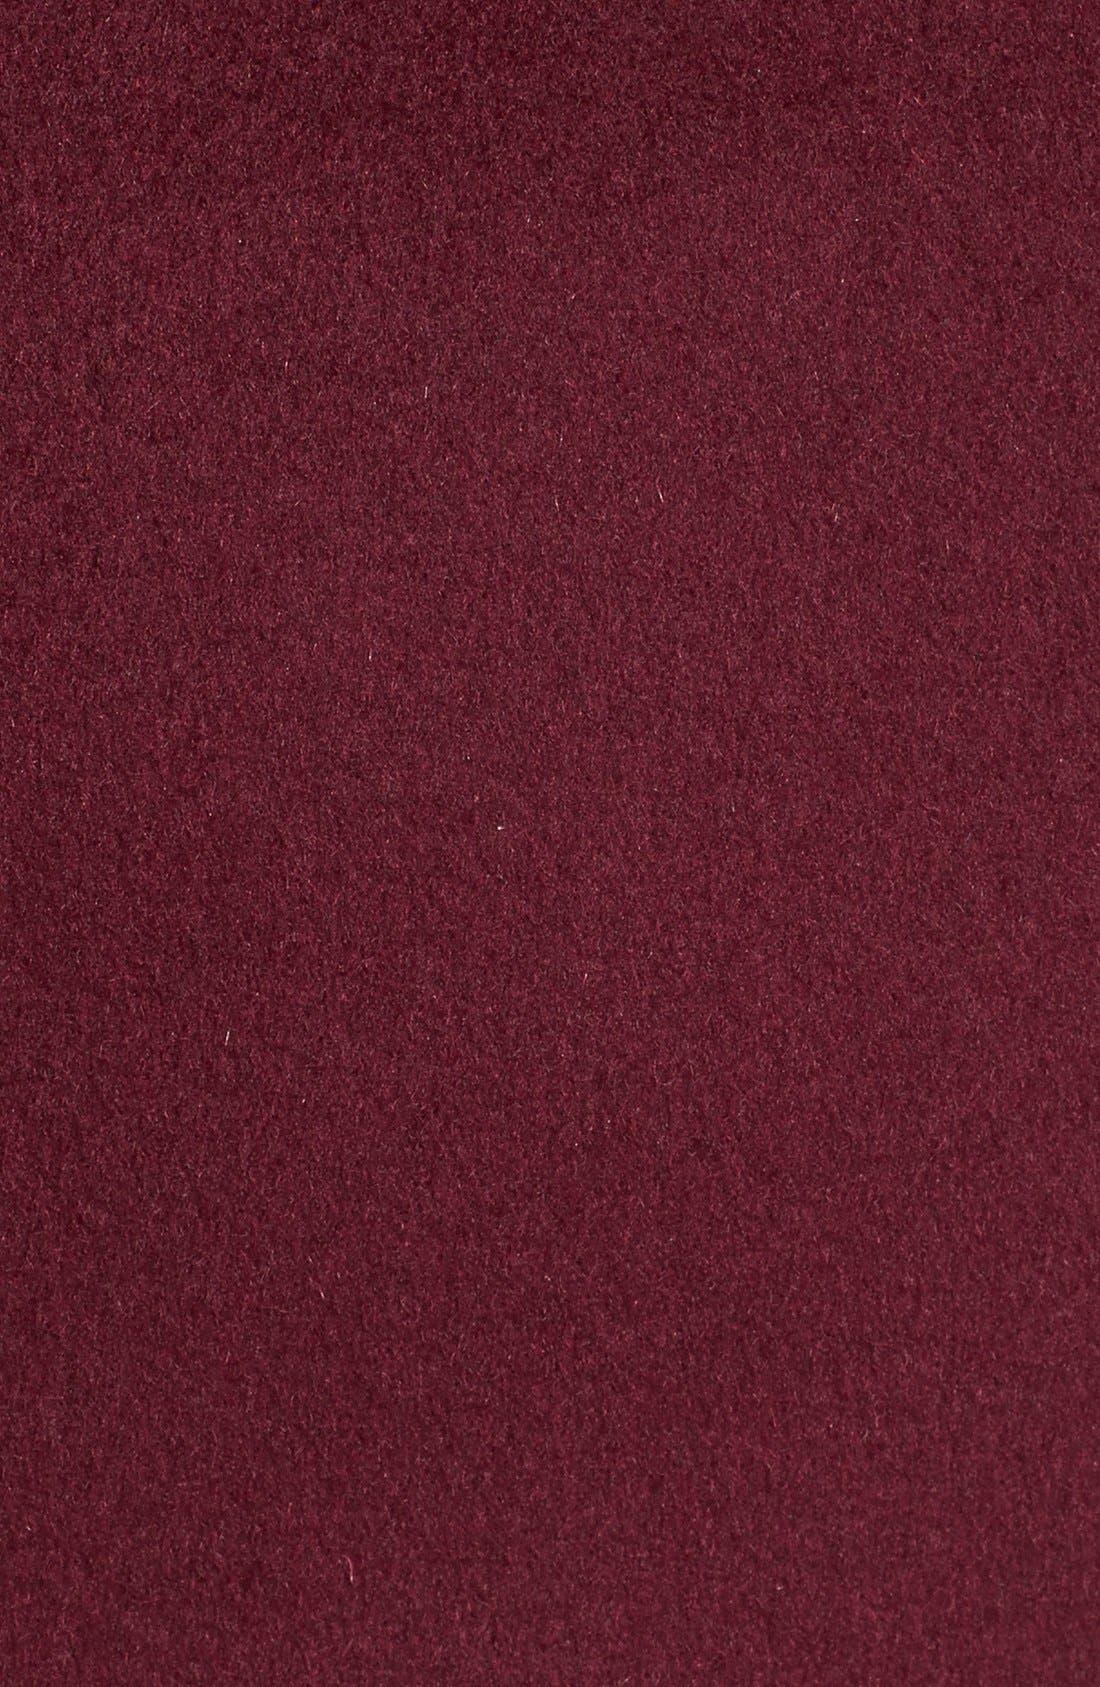 T Tahari Wool Blend Belted Wrap Coat,                             Alternate thumbnail 30, color,